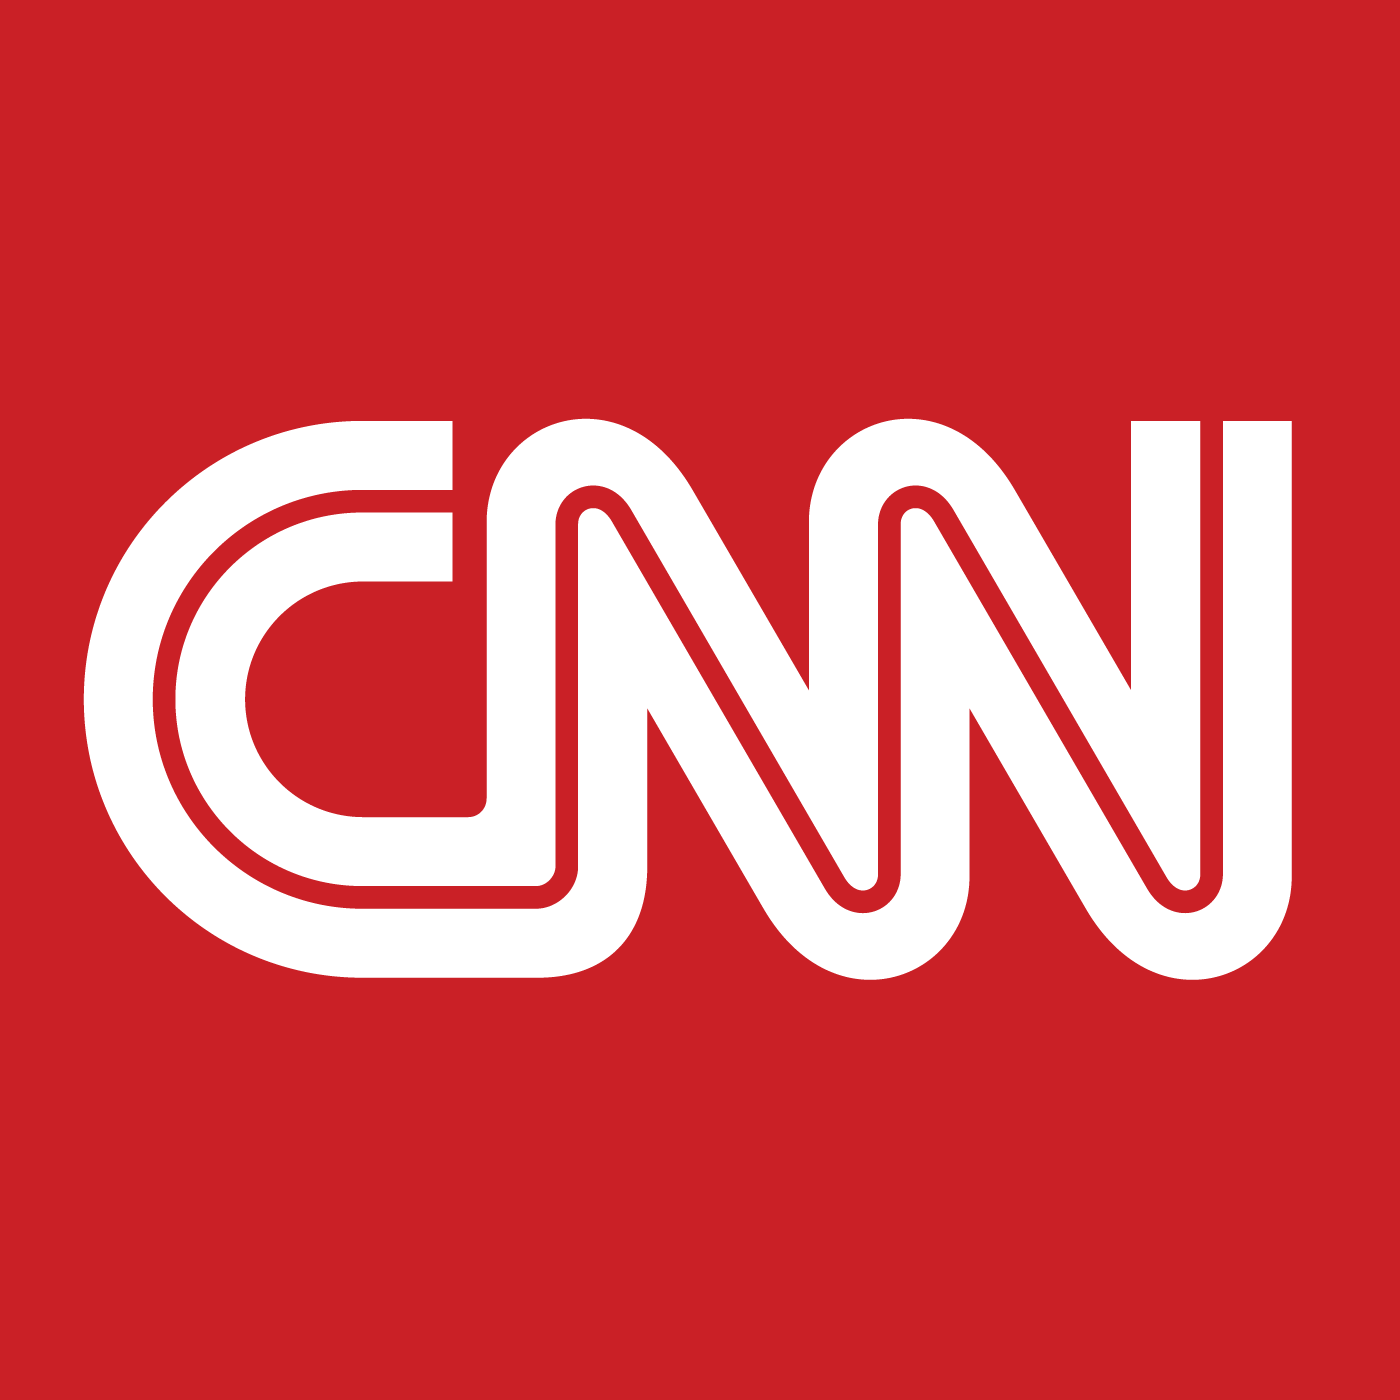 cnn logo square